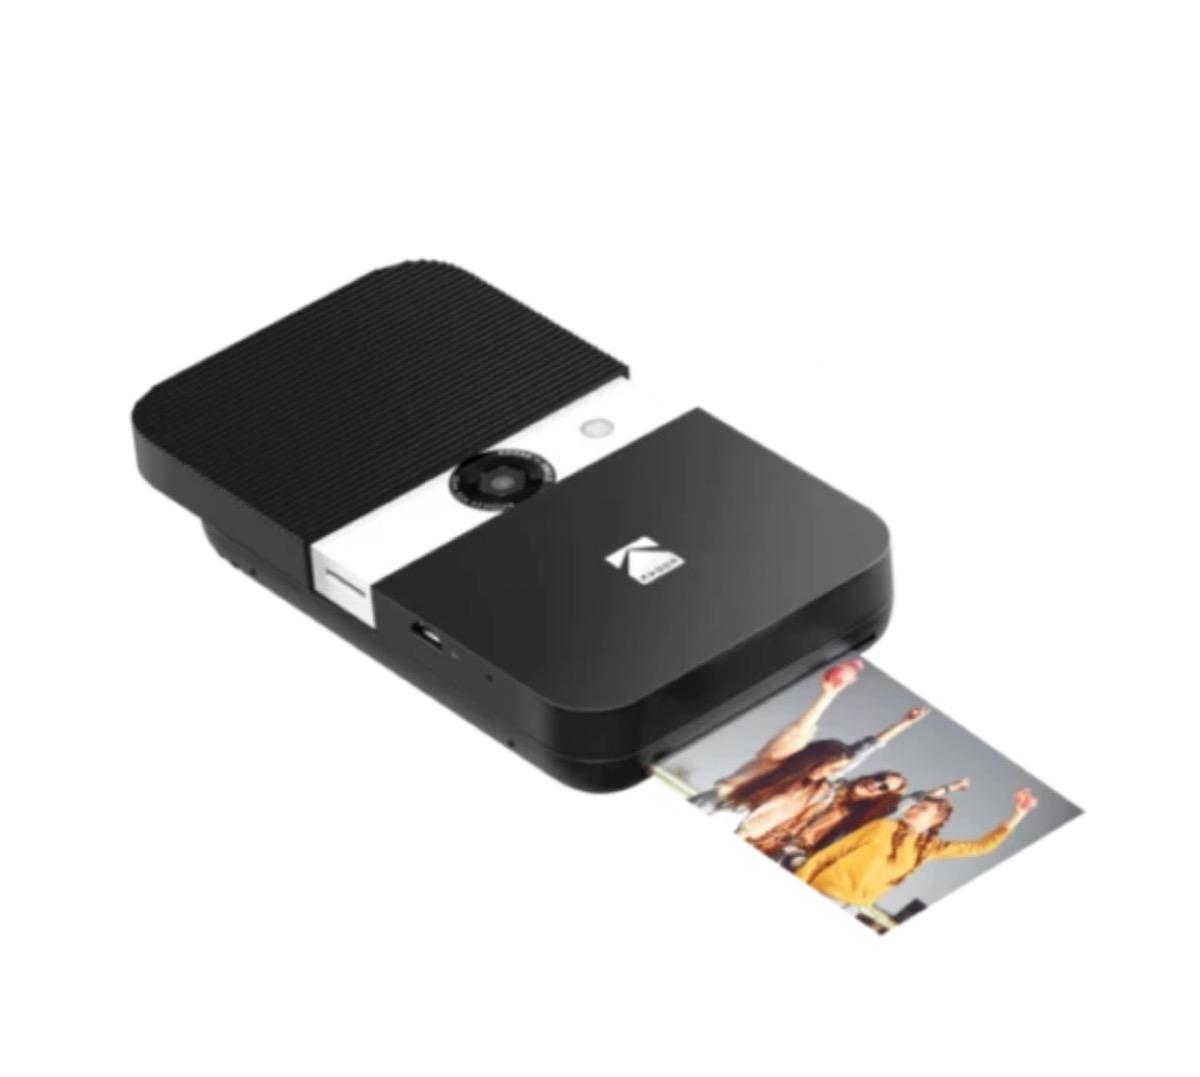 kodak instant print camera, best friend gifts